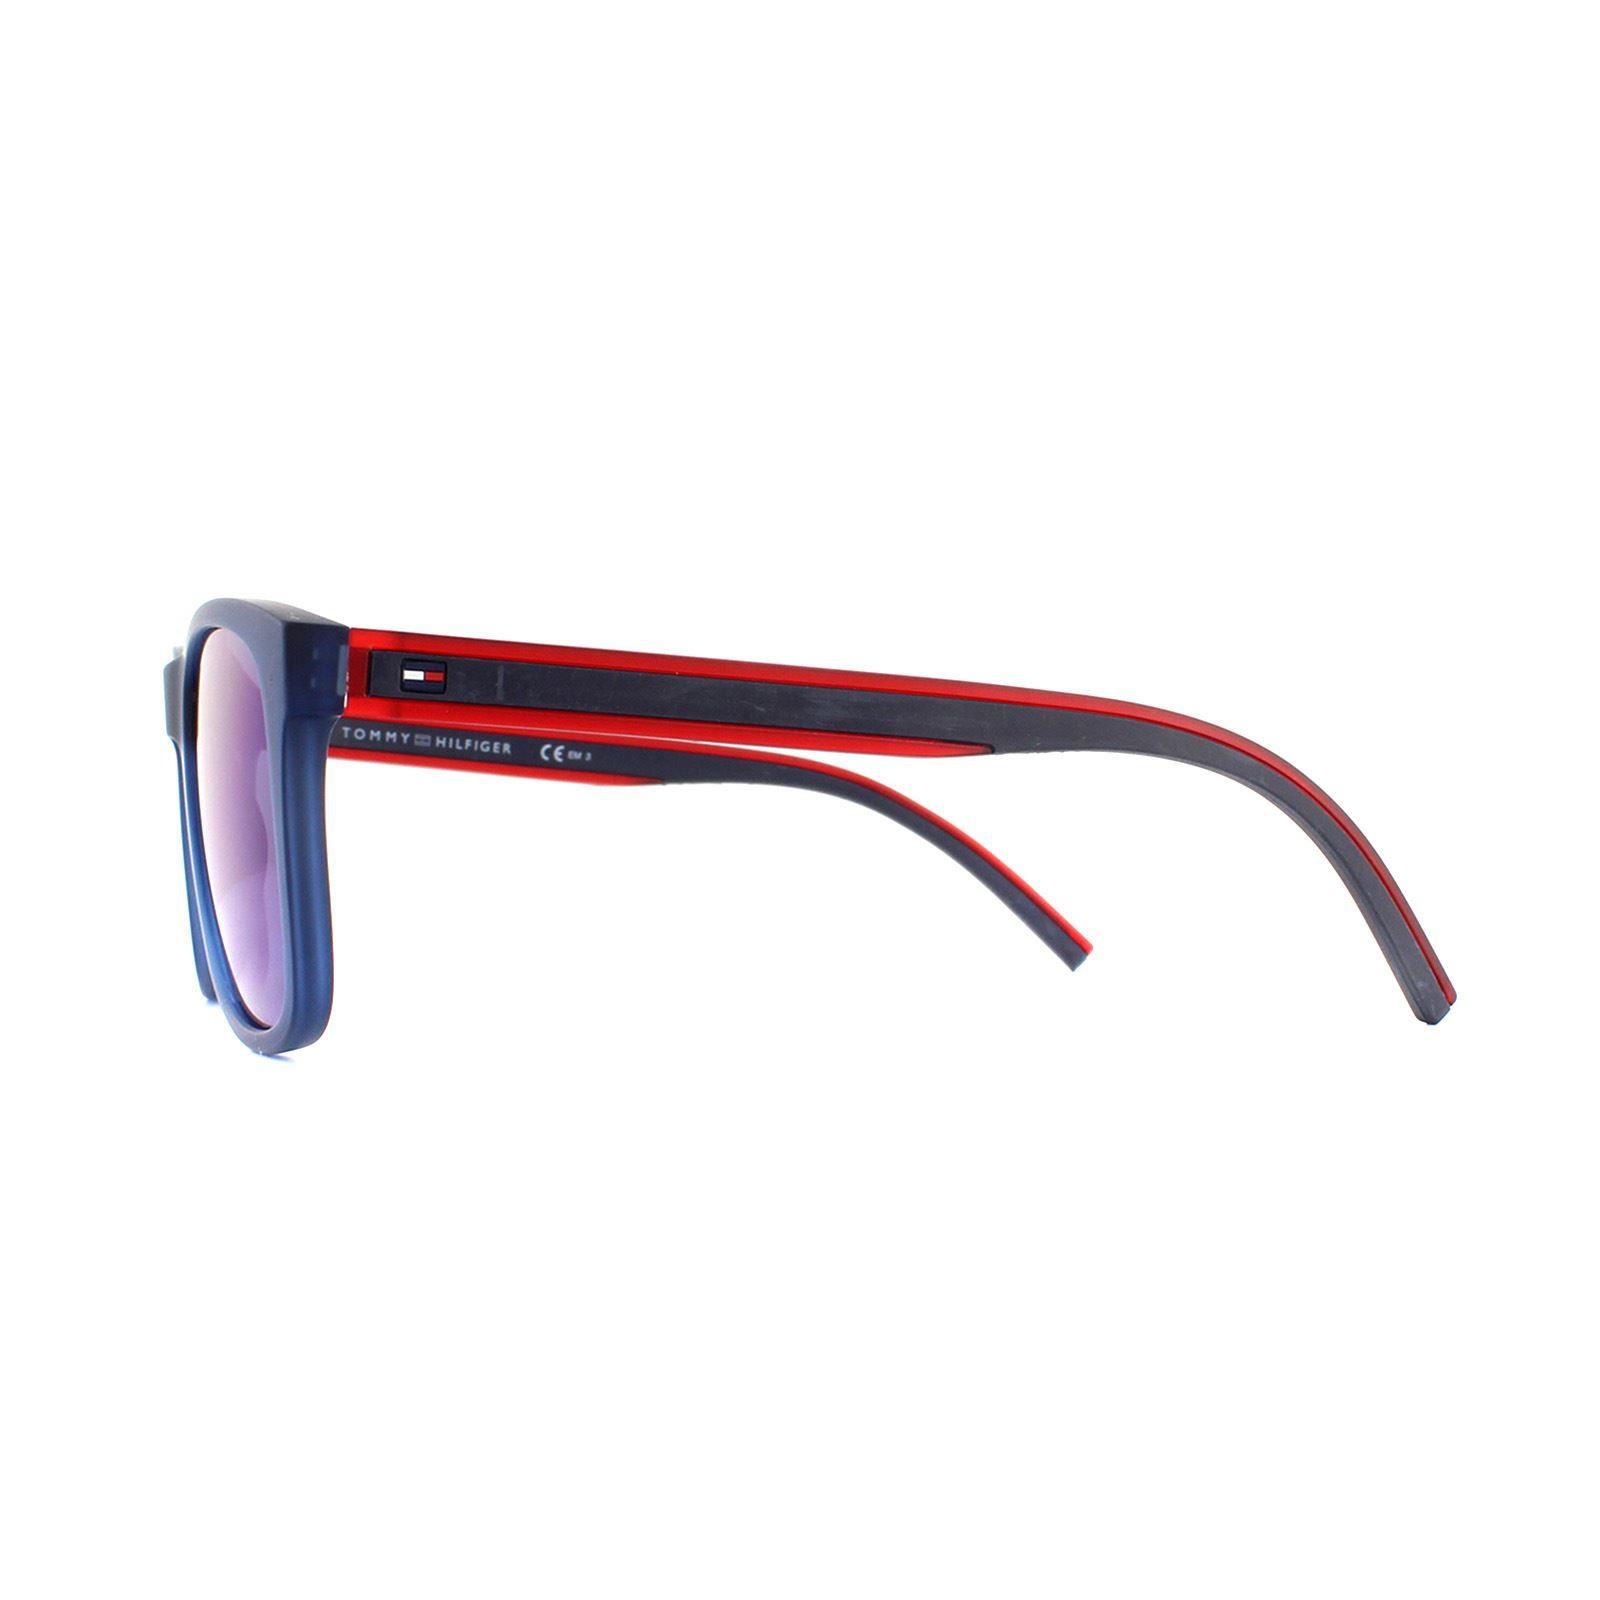 Tommy Hilfiger Sunglasses Th 1493/S Pjp Xt Blue Blue Sky Mirror